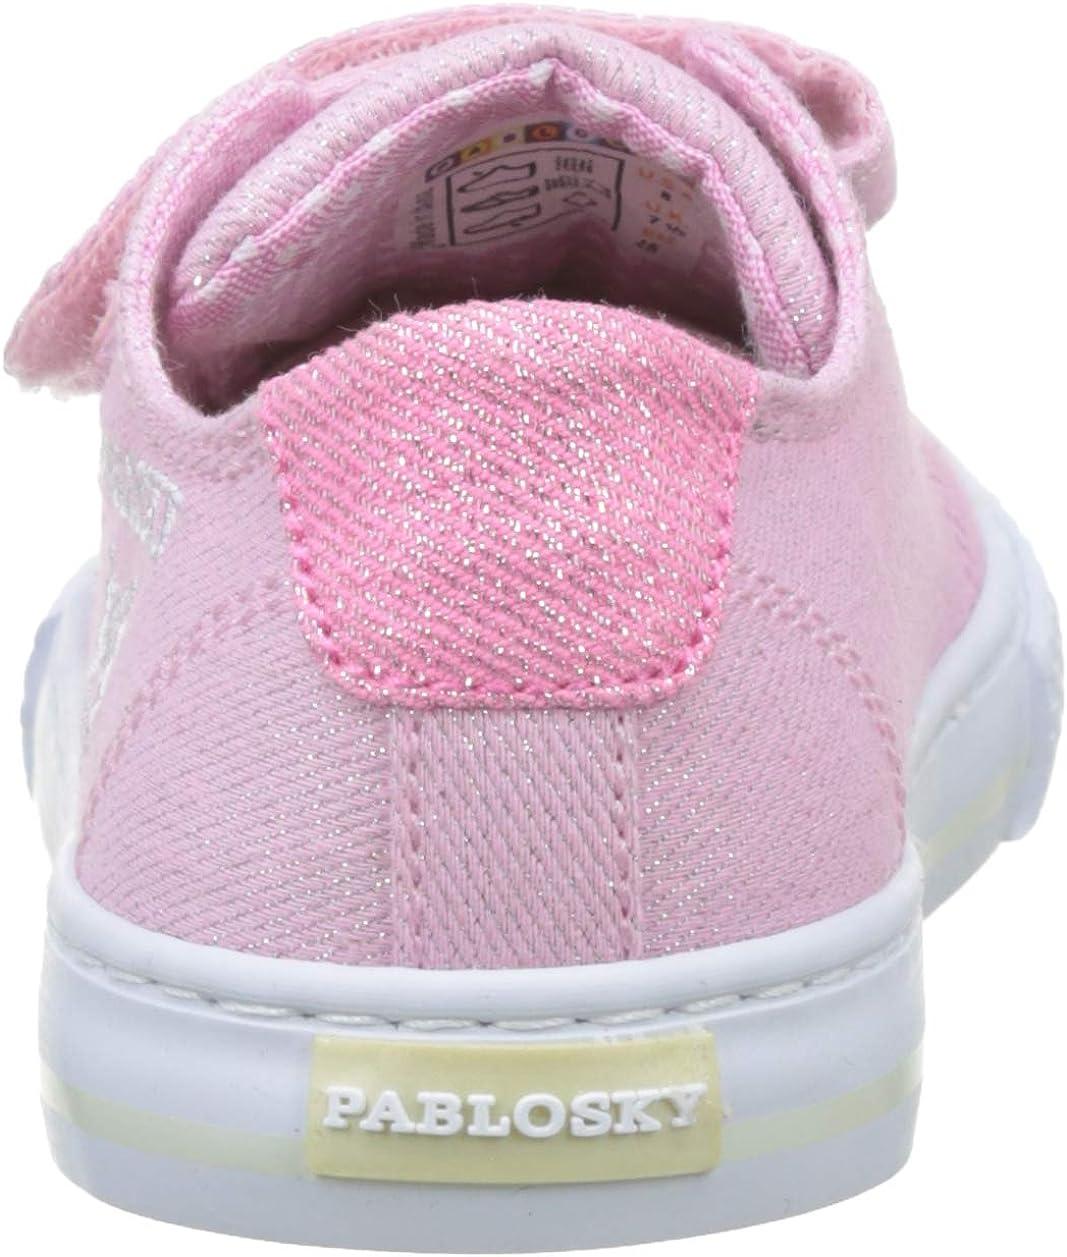 Pablosky Zapatillas-Ni/ña para Ni/ñas